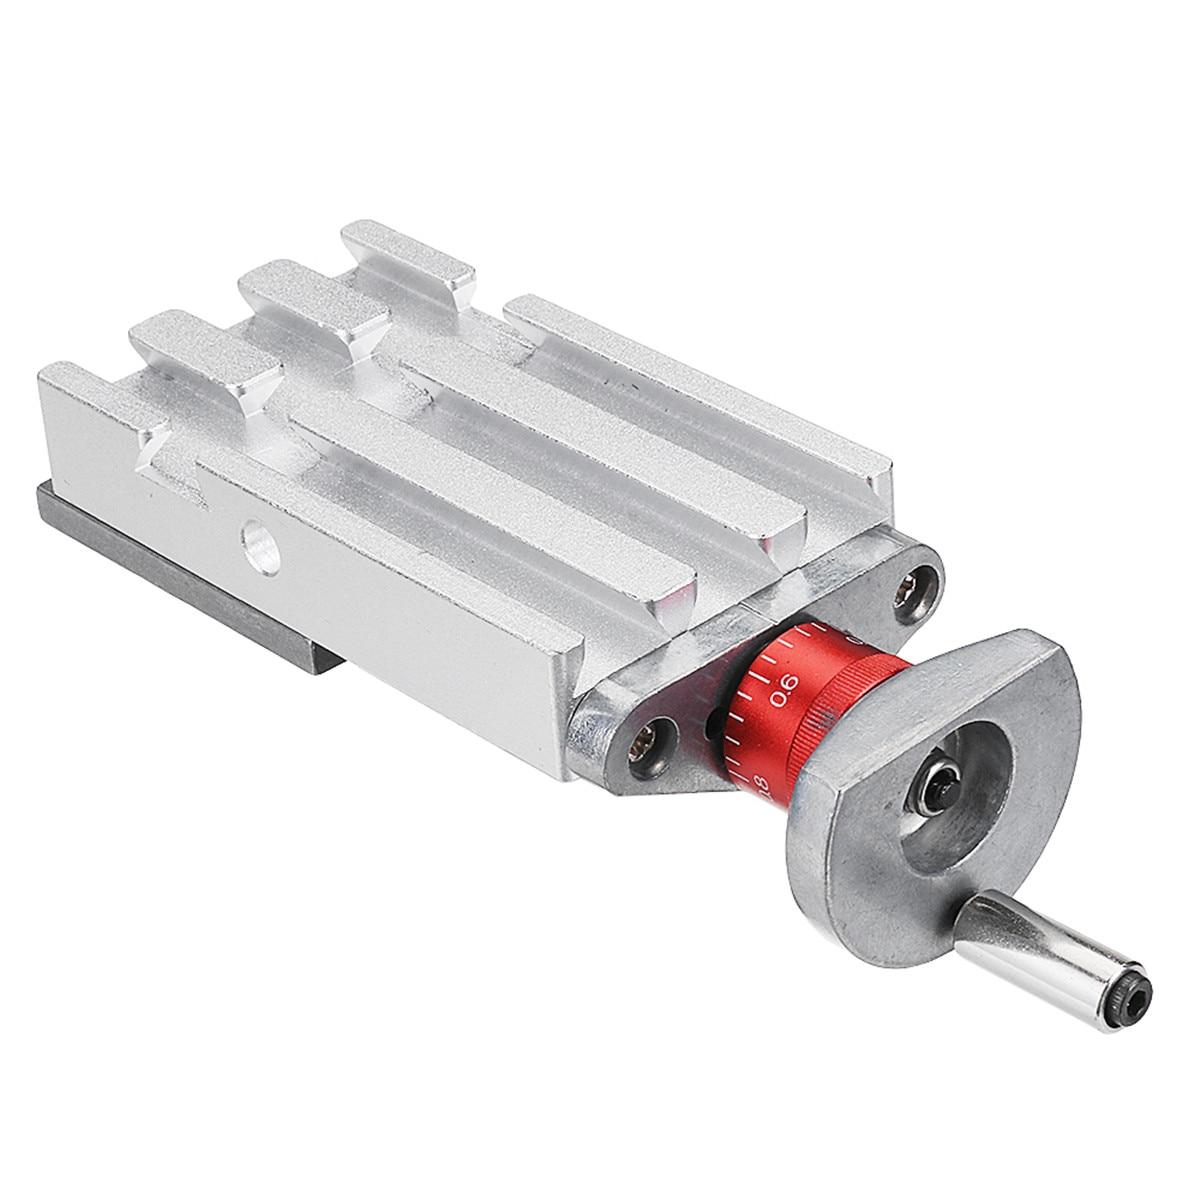 118mm Metal Cross Slide Longitudinal Slide Block Z008m For Mini Lathe Feeding Relieving Axis Y Z Tool Parts Aliexpress